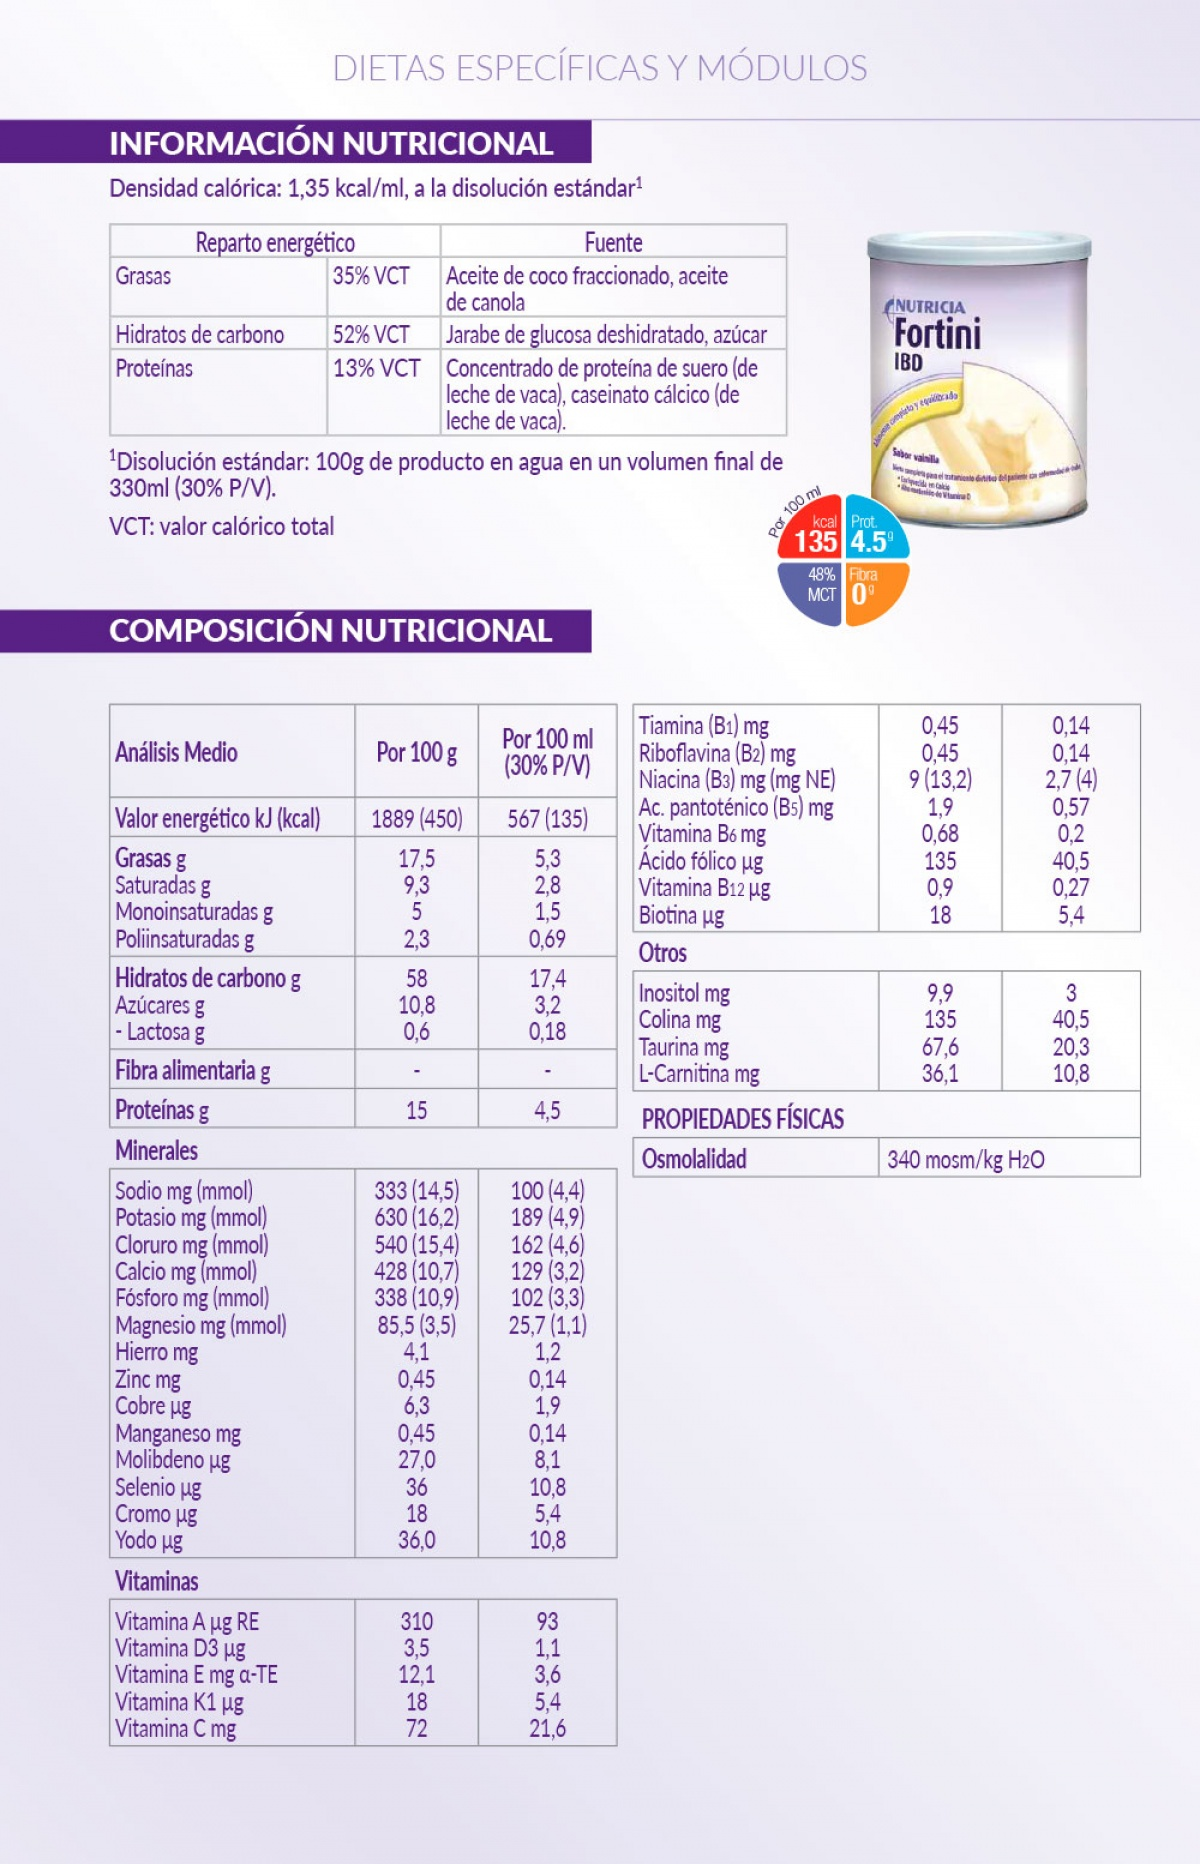 Información de Fortini IBD